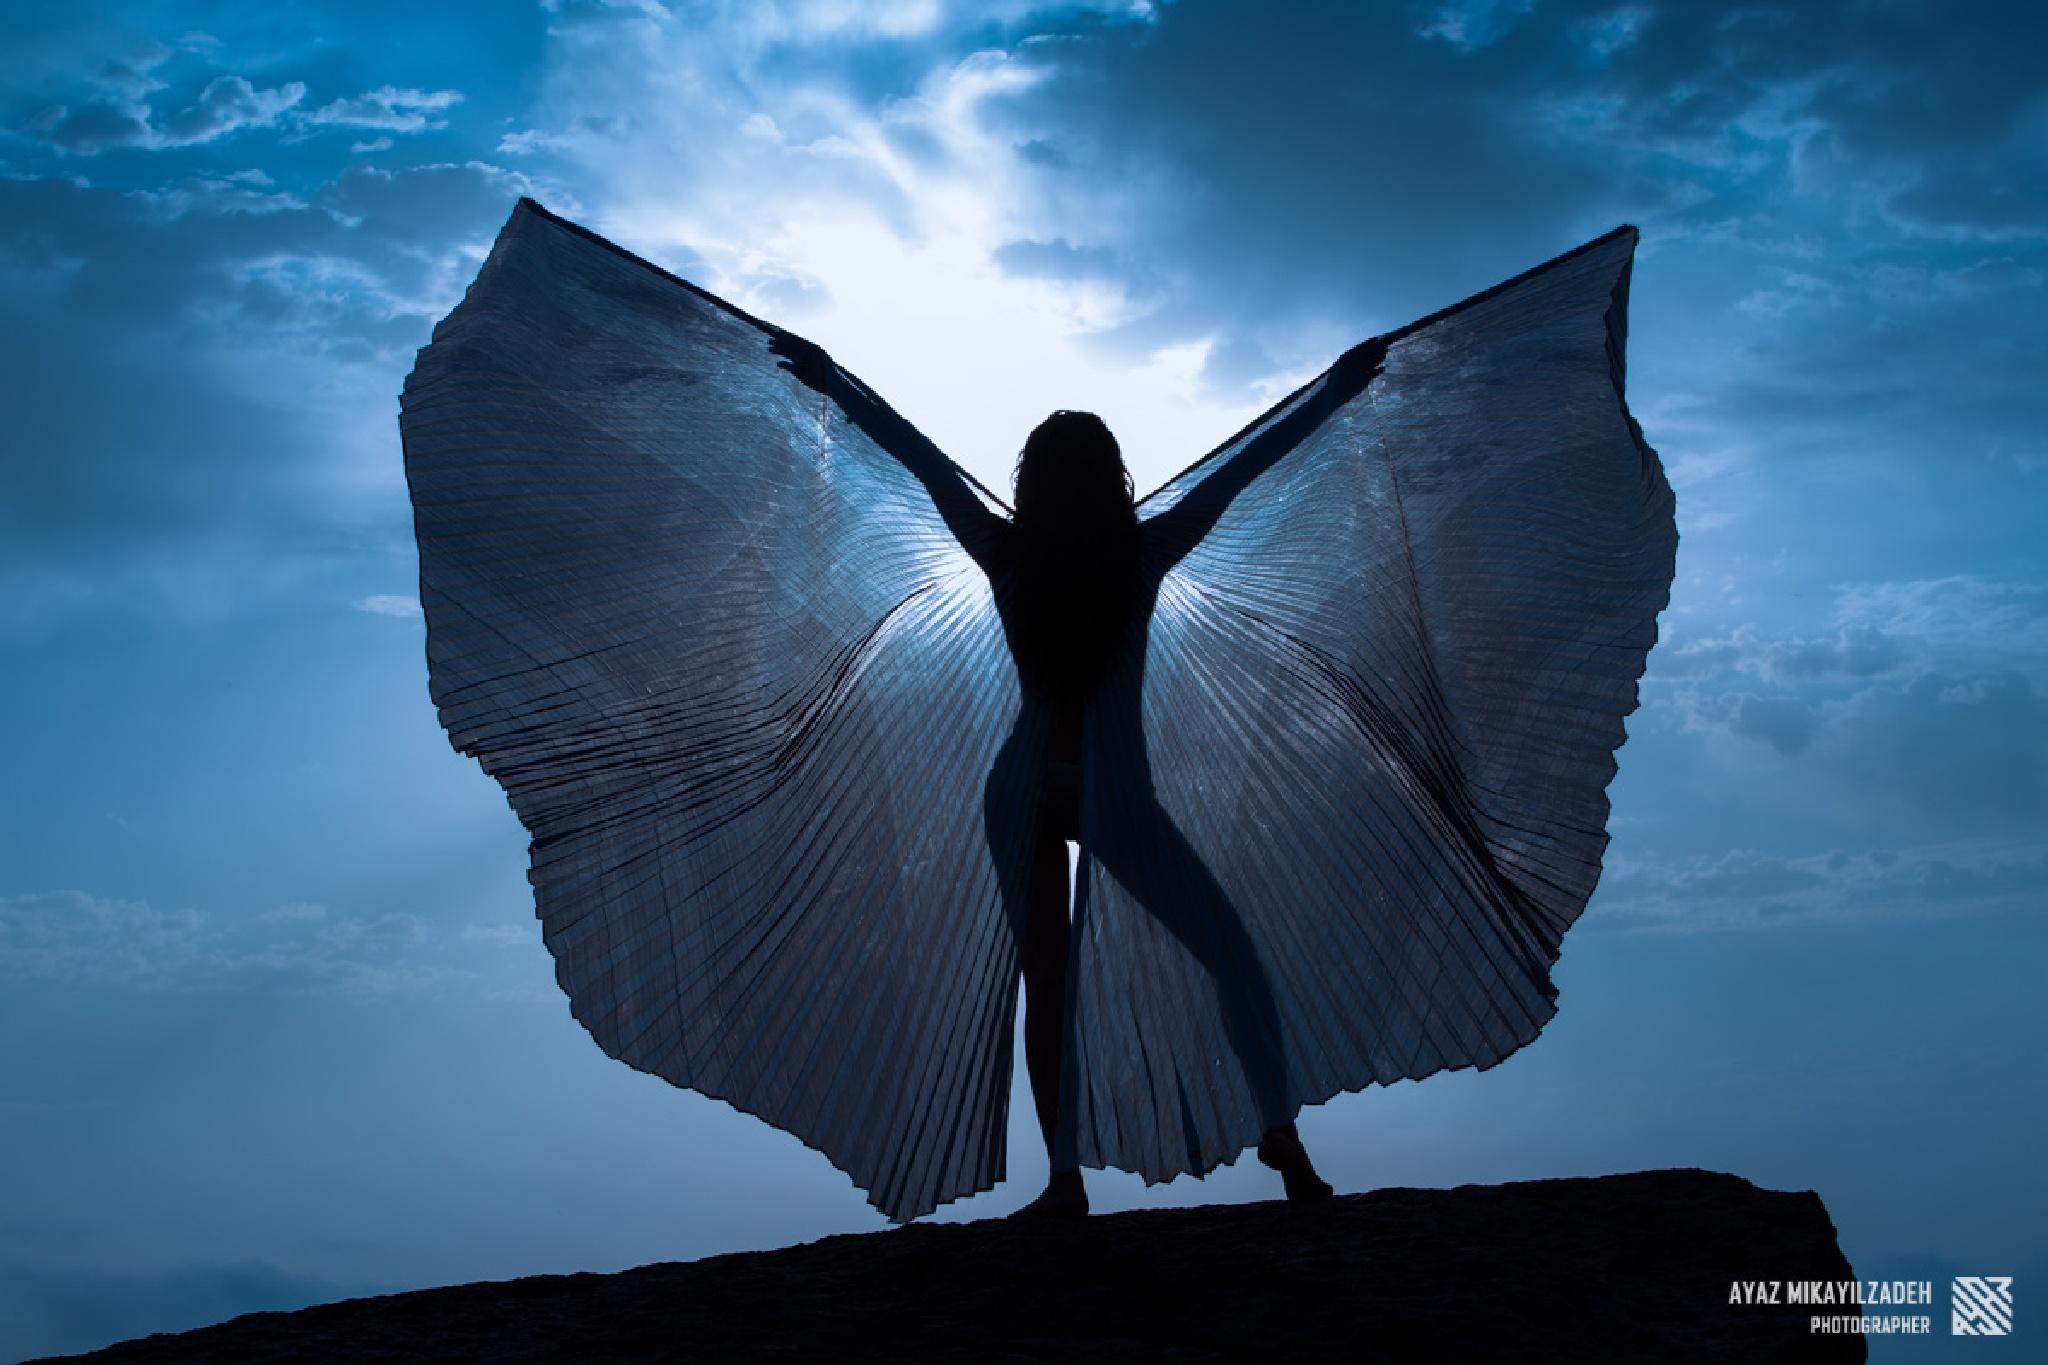 Butterfly effect by Ayaz Mikayilzadeh